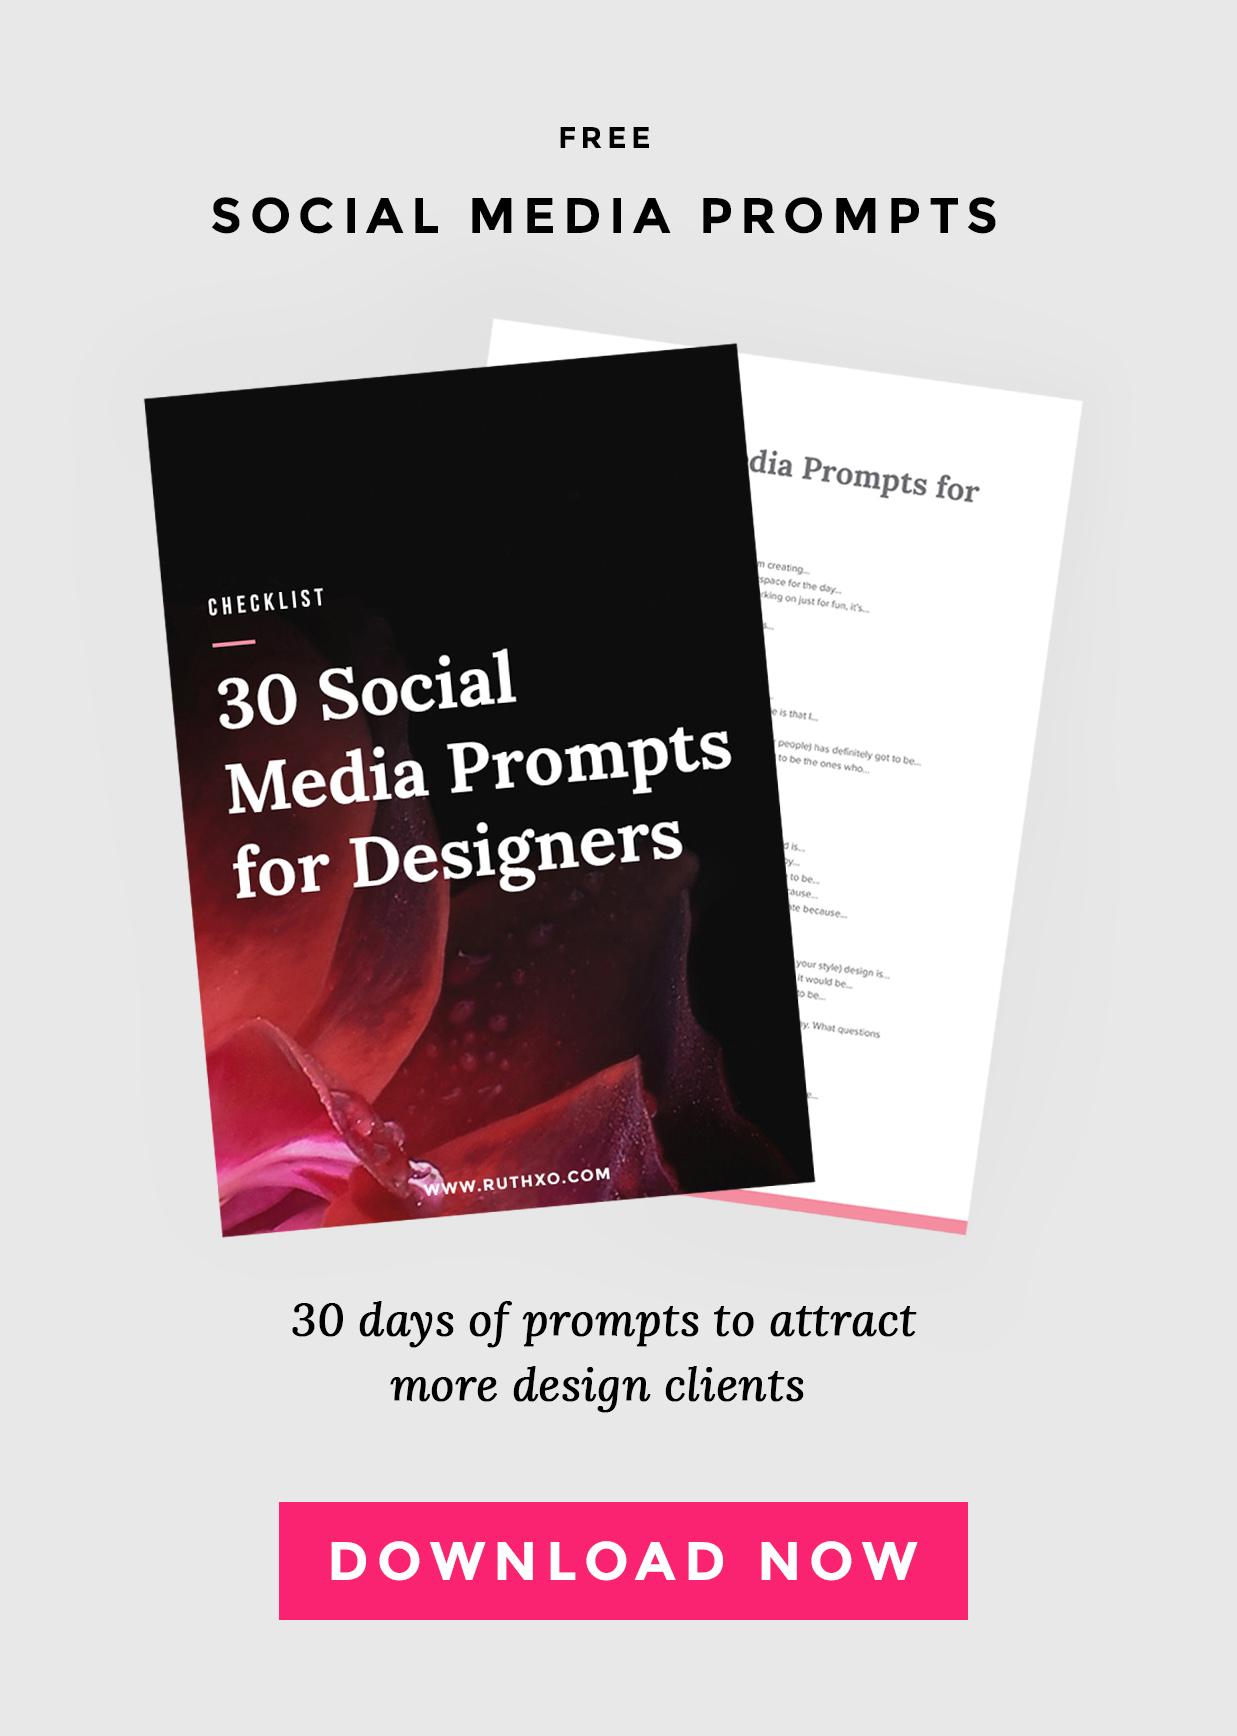 30 Social Media Prompts for Designers